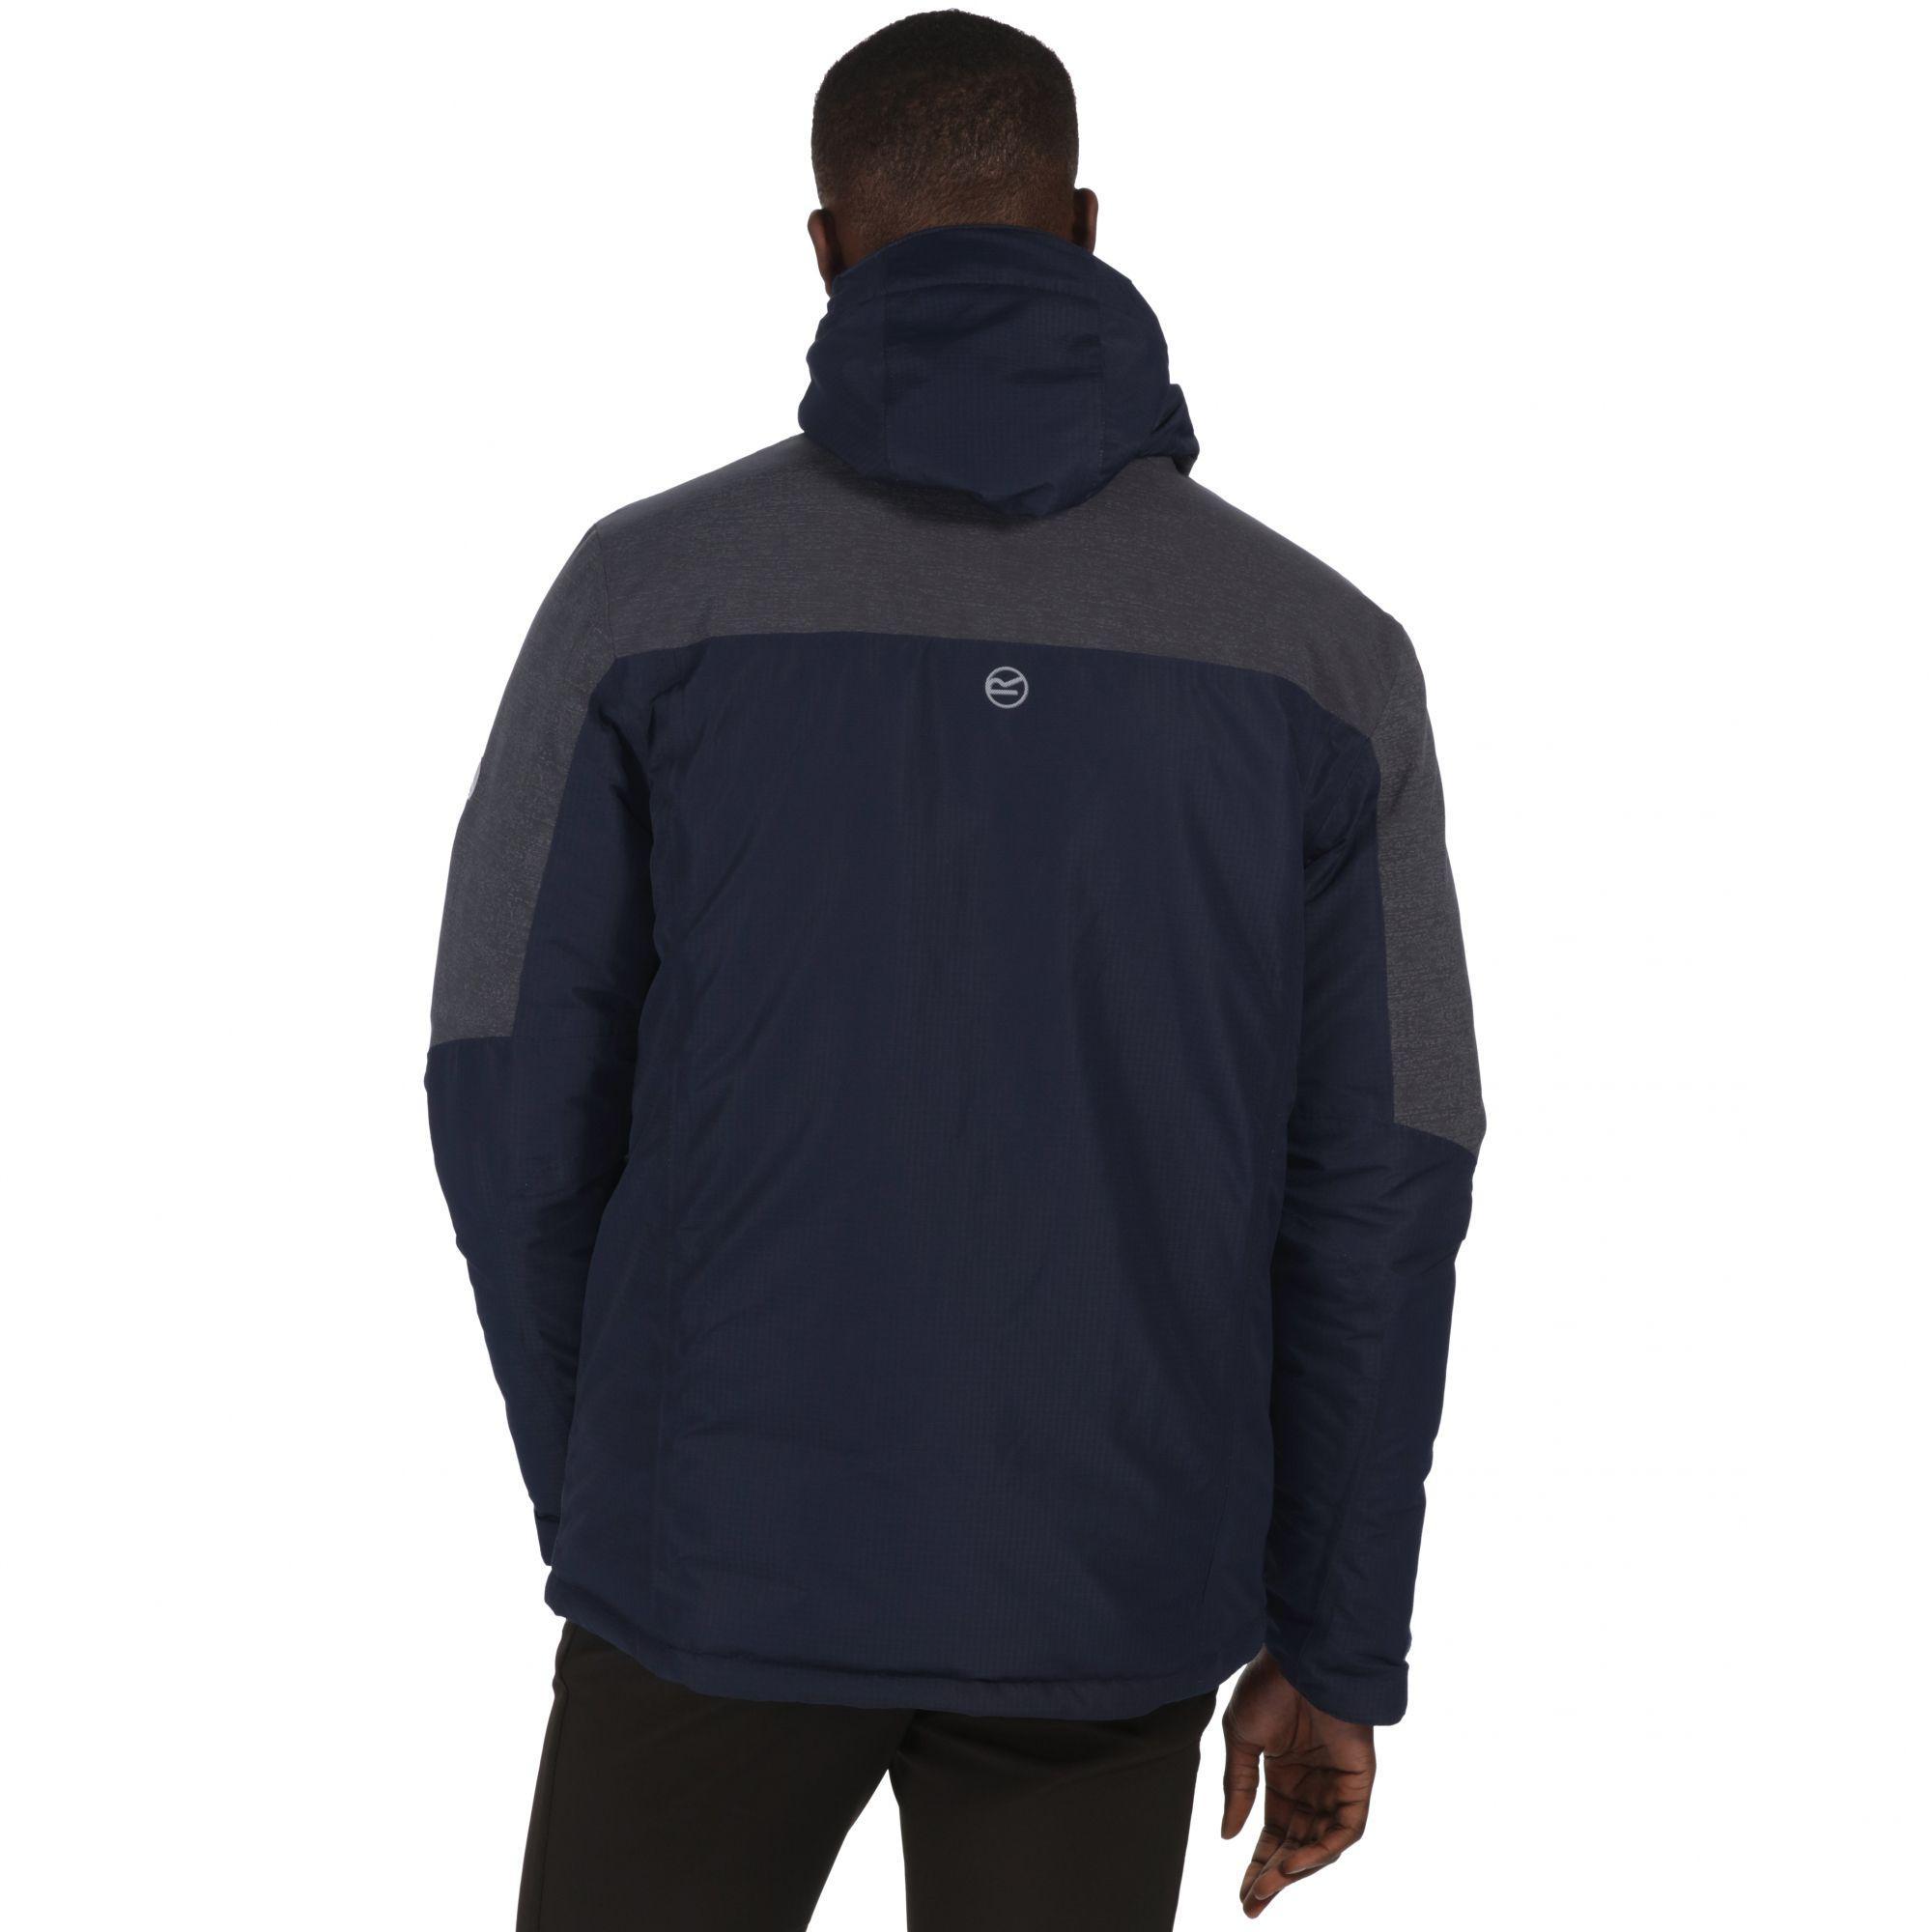 Regatta Blue 'garforth' Waterproof Insulated Jacket for Men